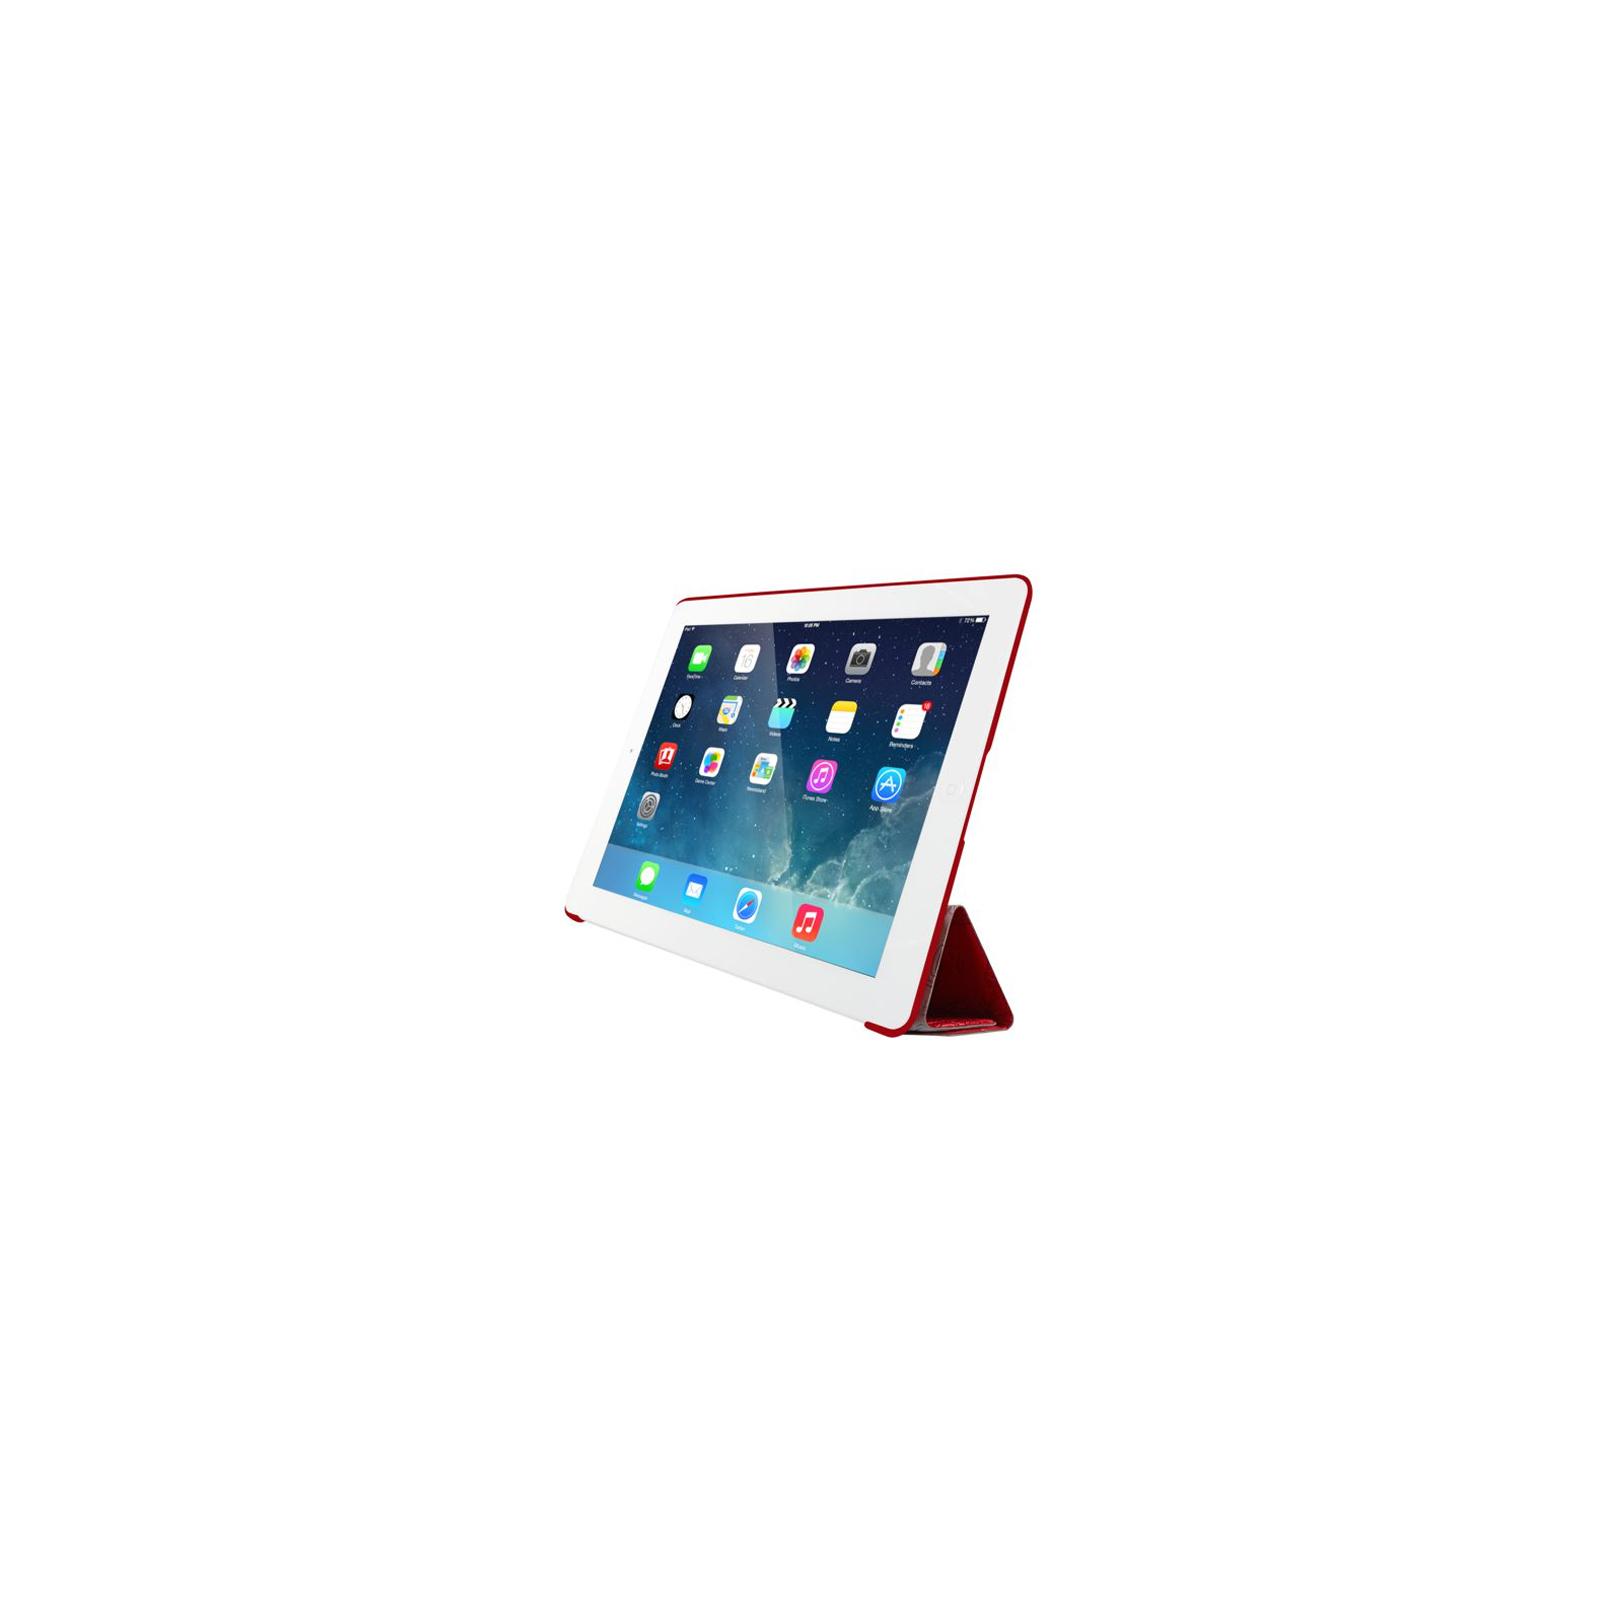 Чехол для планшета OZAKI iPad Air O!coat Travel 360° Multiangle (OC111BJ) изображение 2